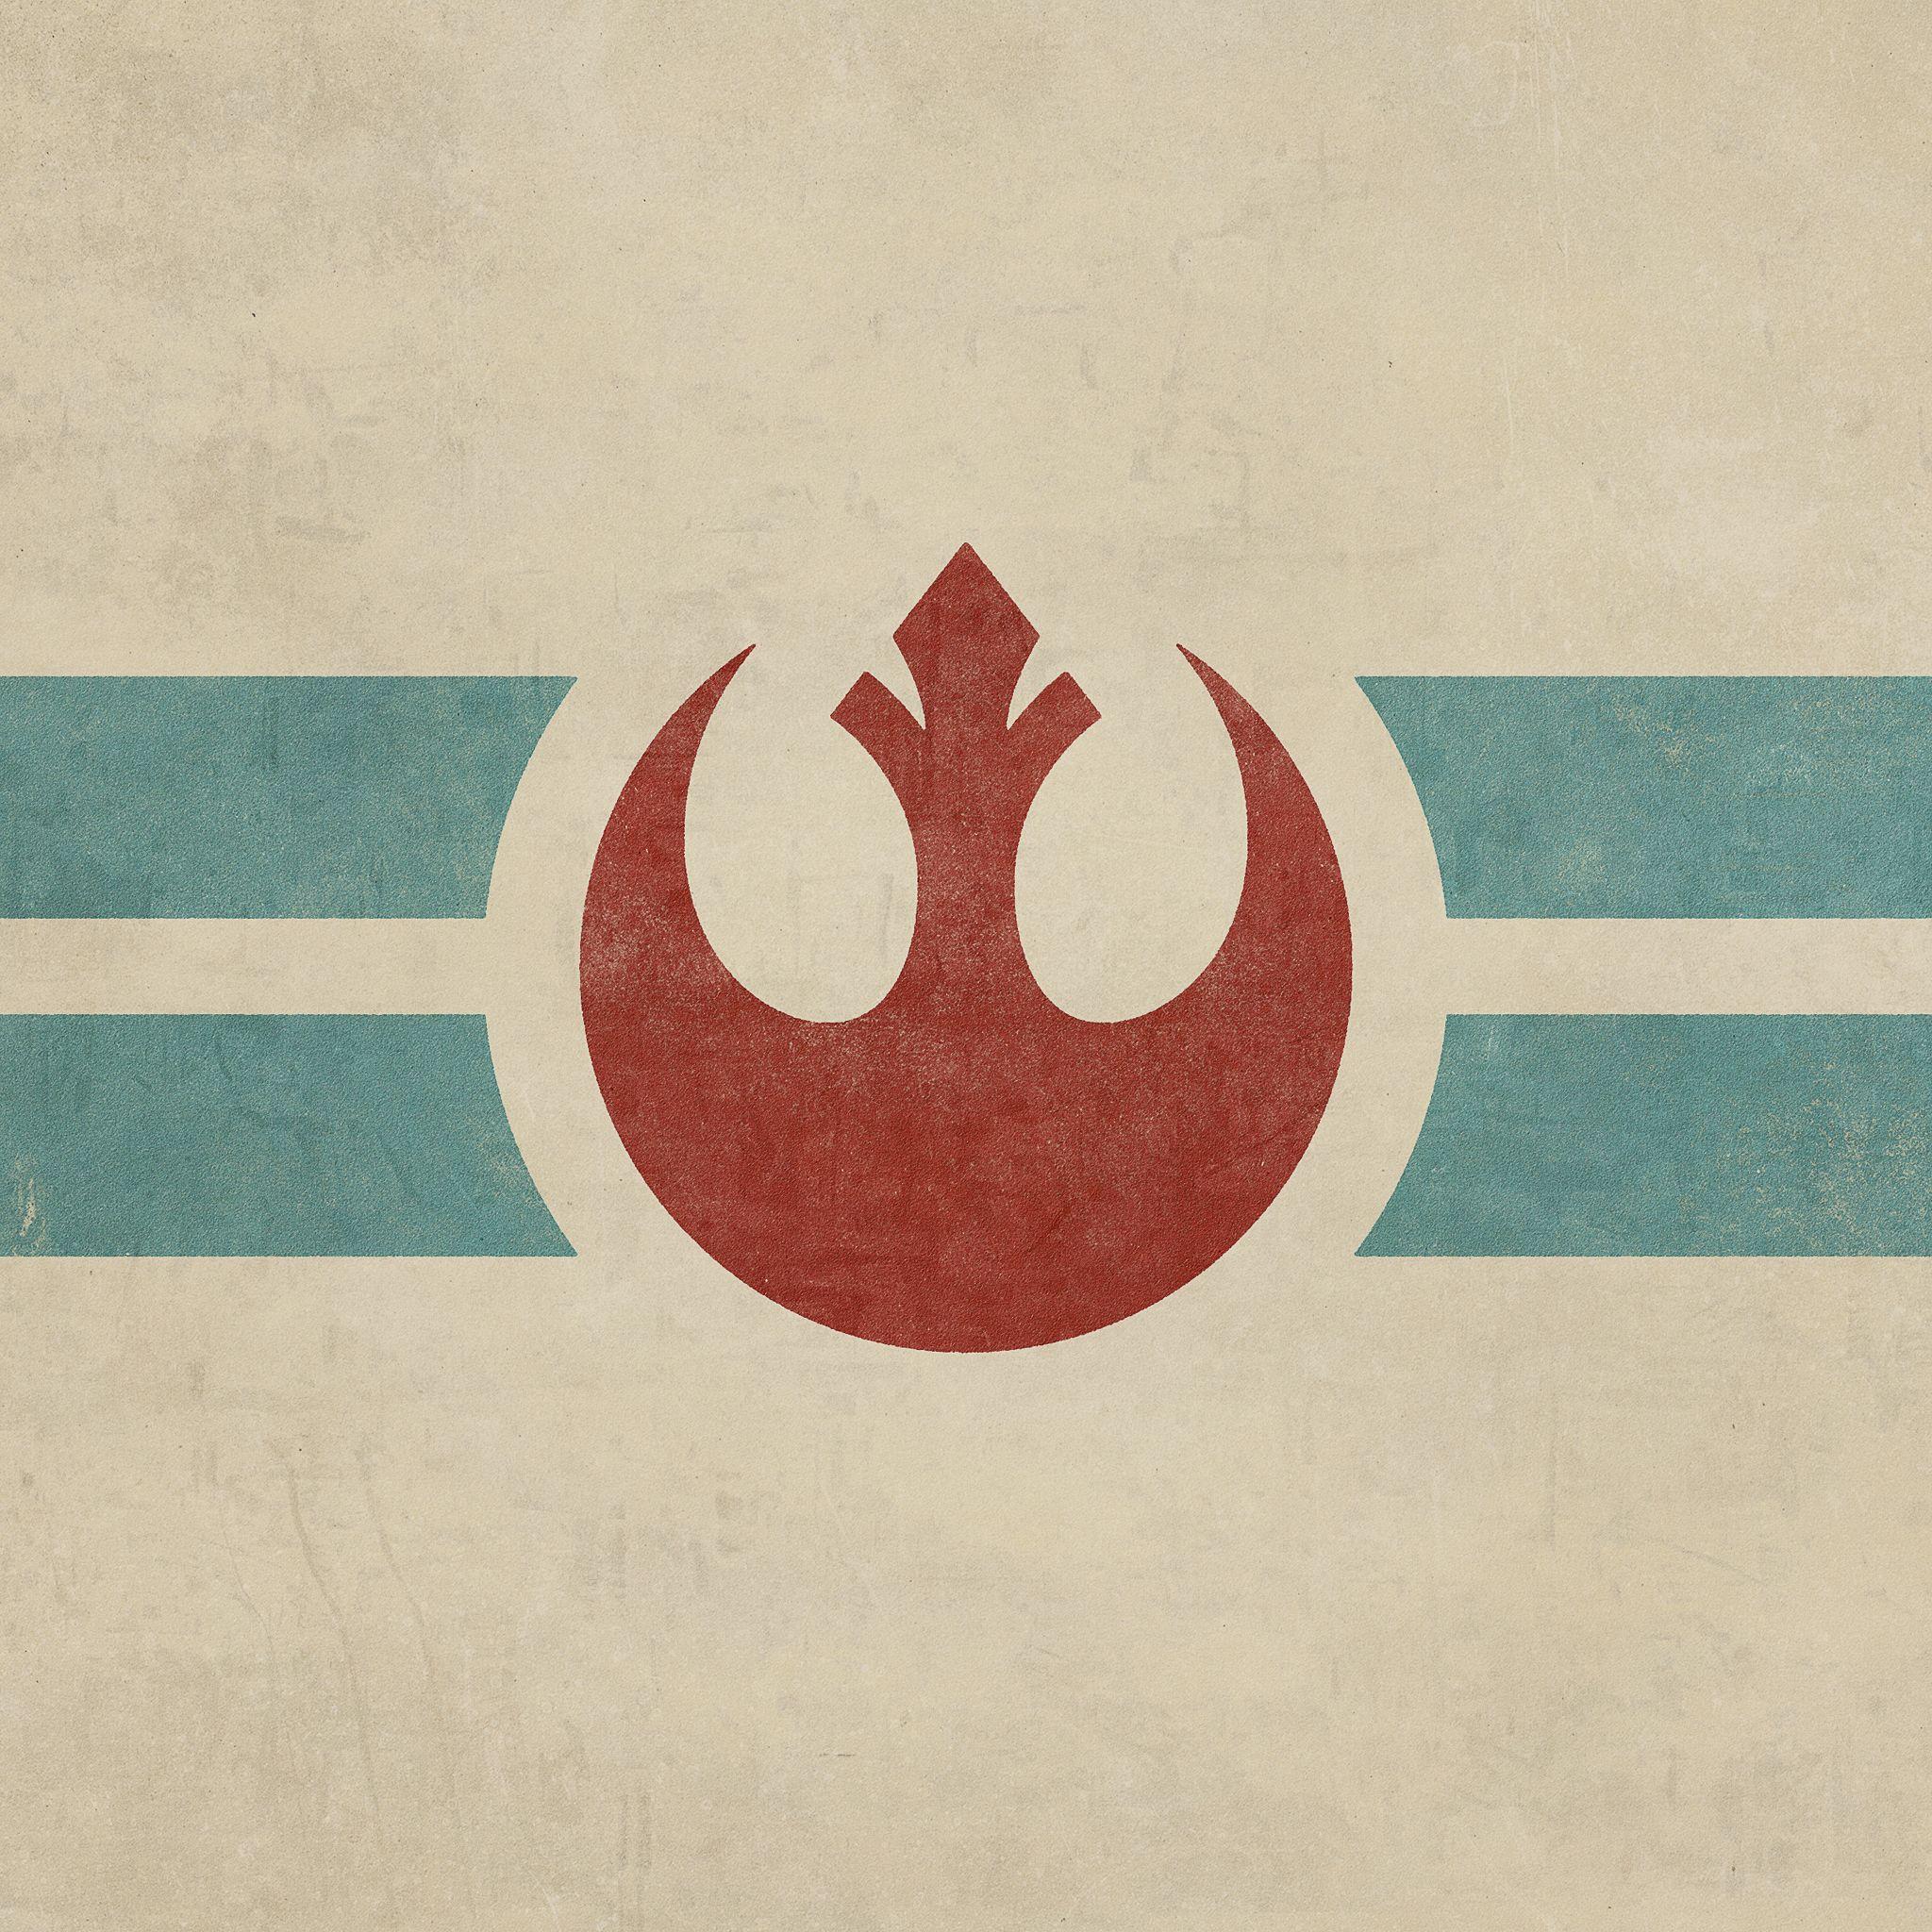 Index Of Wallpaper Star Wars Data Src Full 157289 Rebel Alliance 3002352 Hd Wallpaper Backgrounds Download